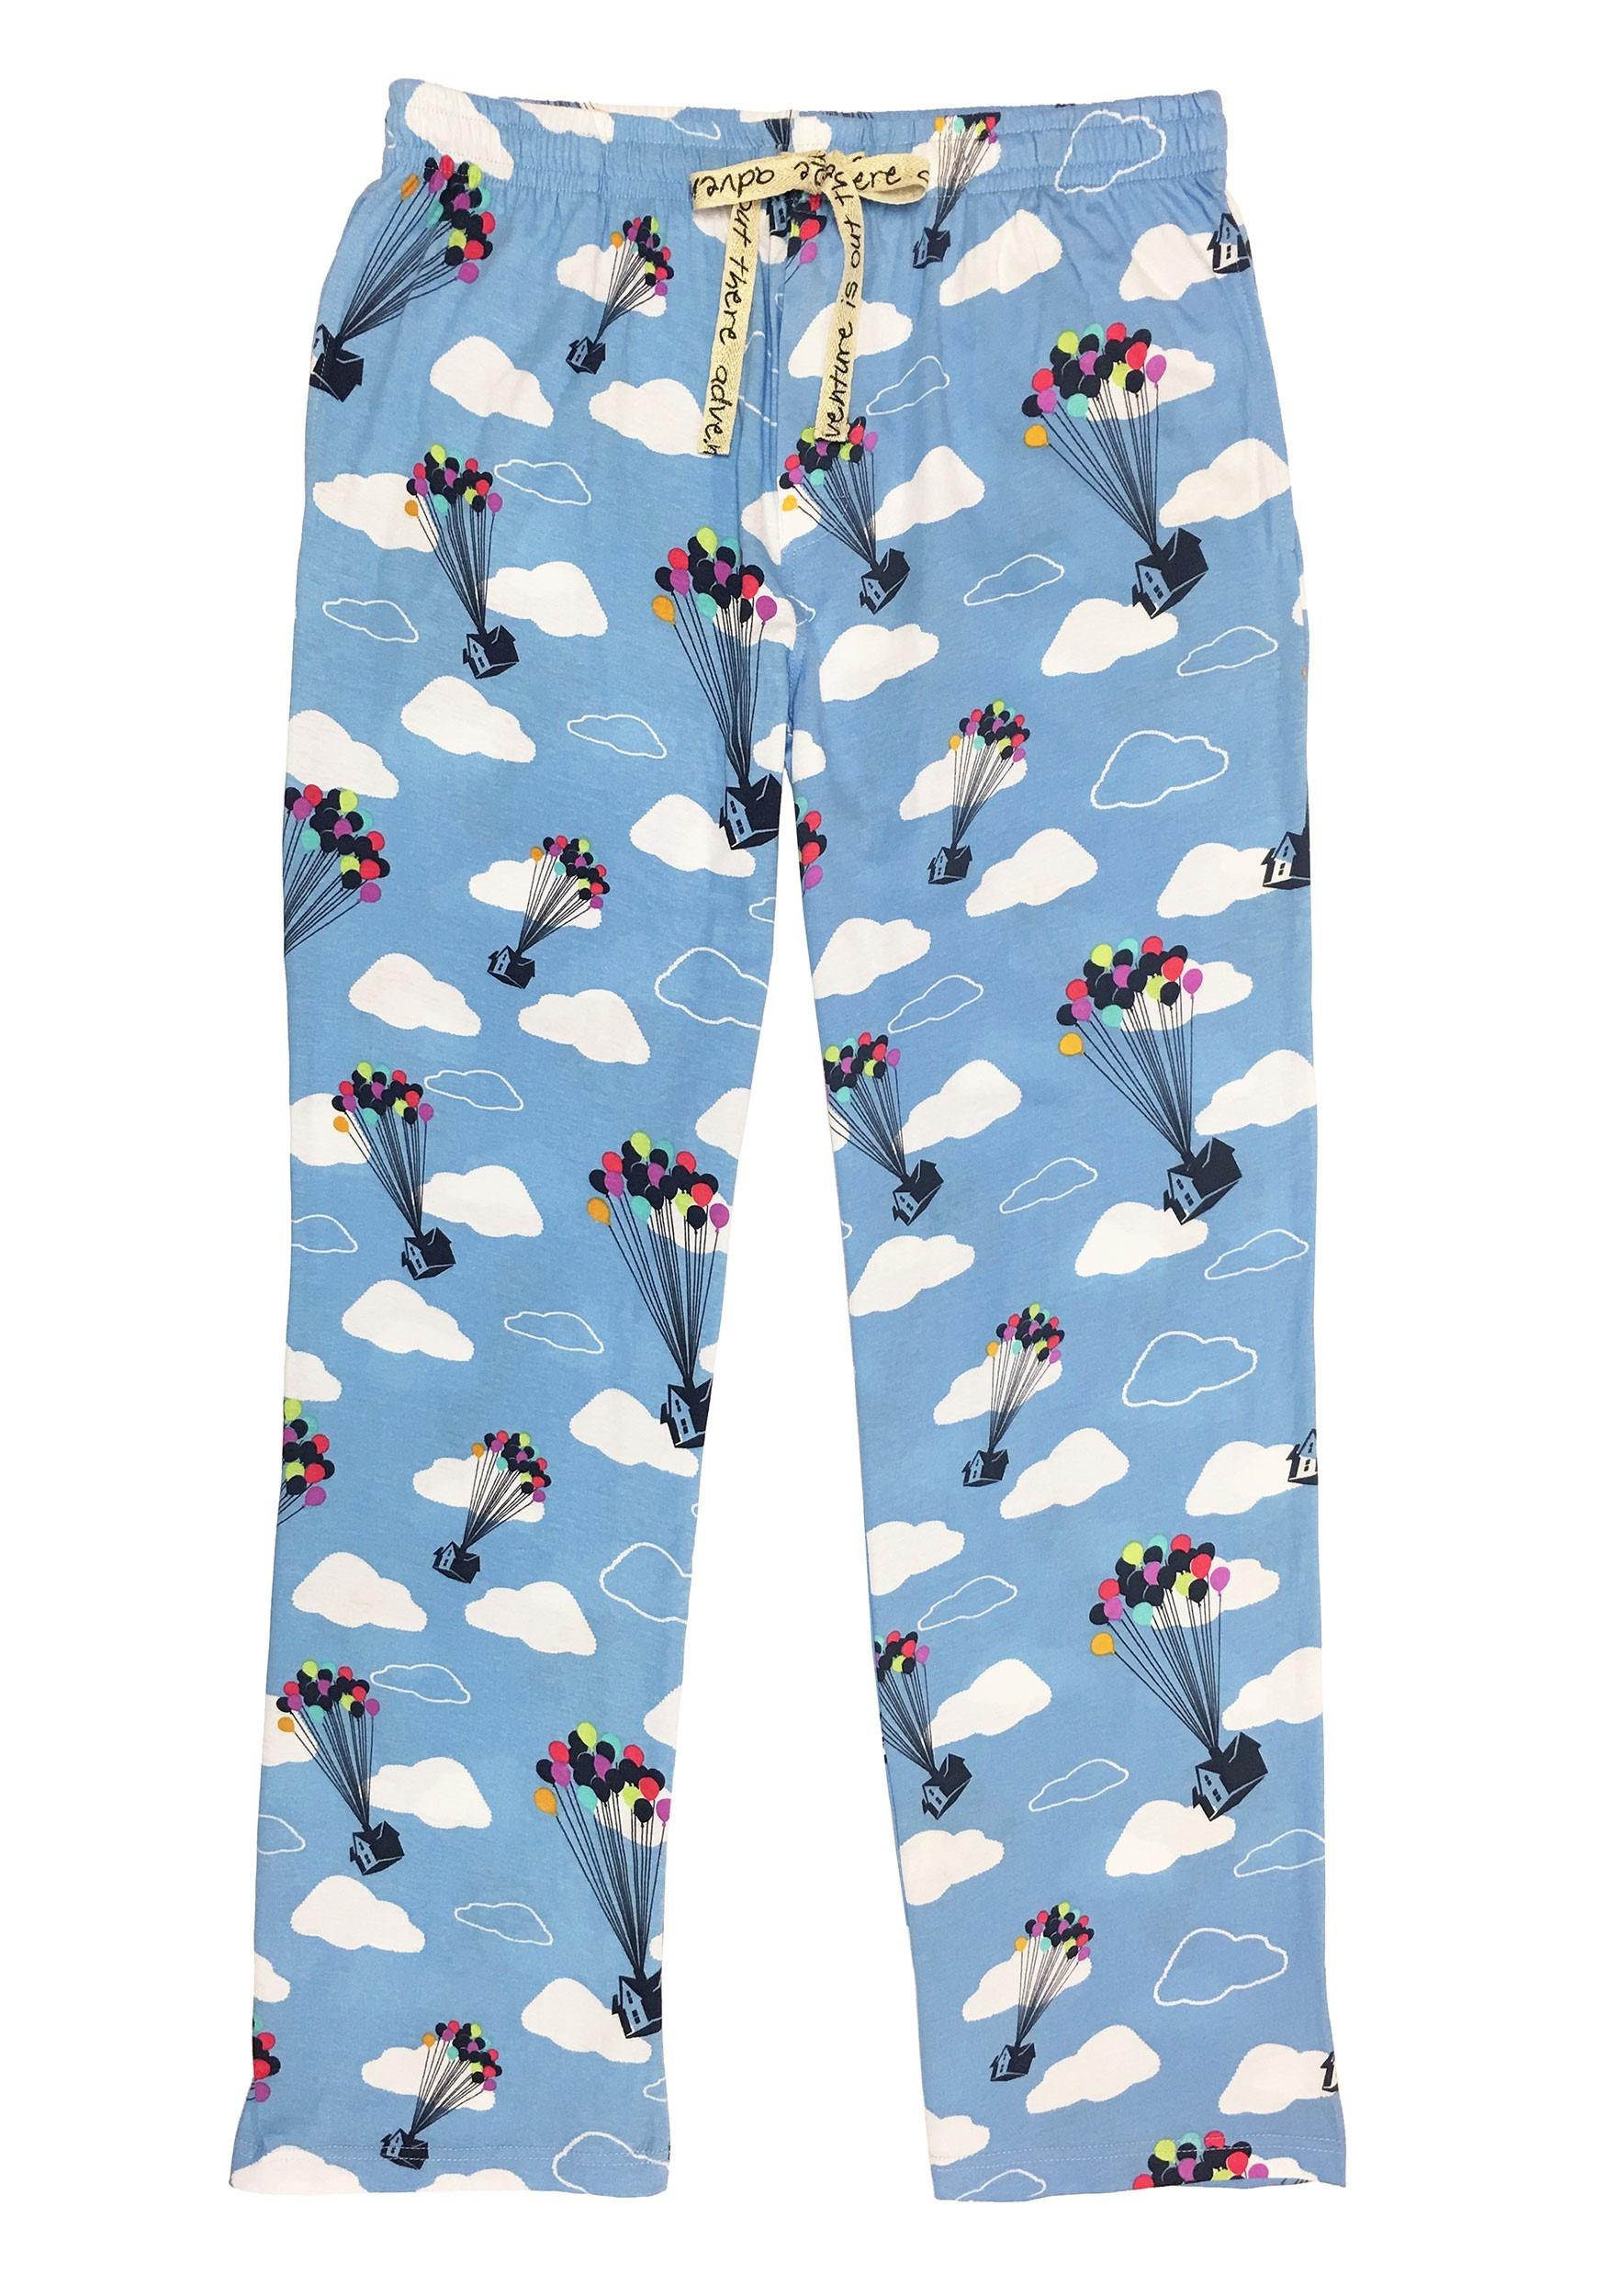 Pixar's Up Cloud Print Light Blue Sleep Pants for Adults